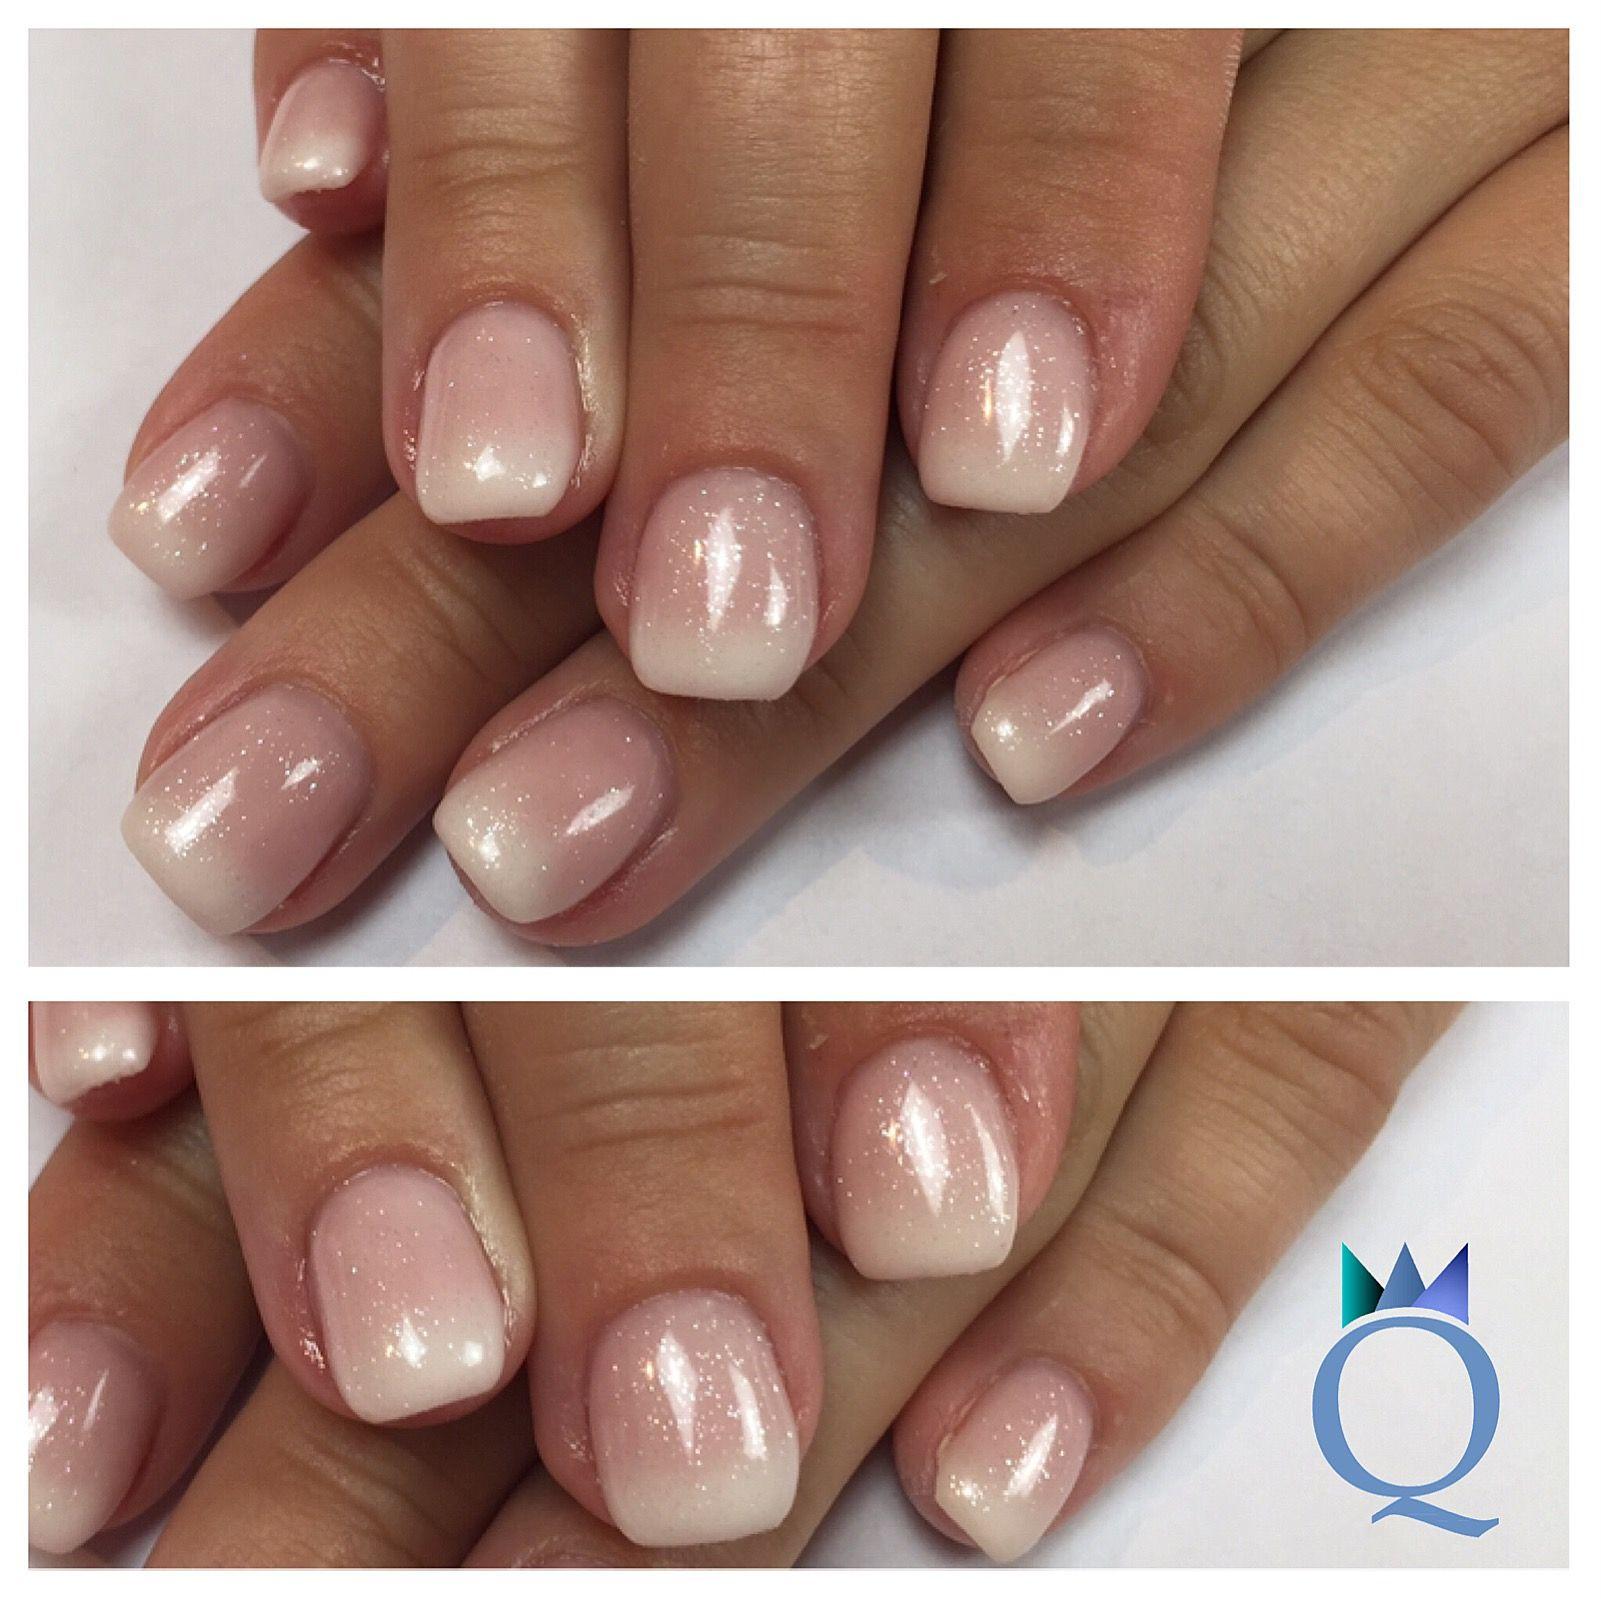 Nageldesign Trends 2019  shortnails gelnails nails babyboomernails glitter